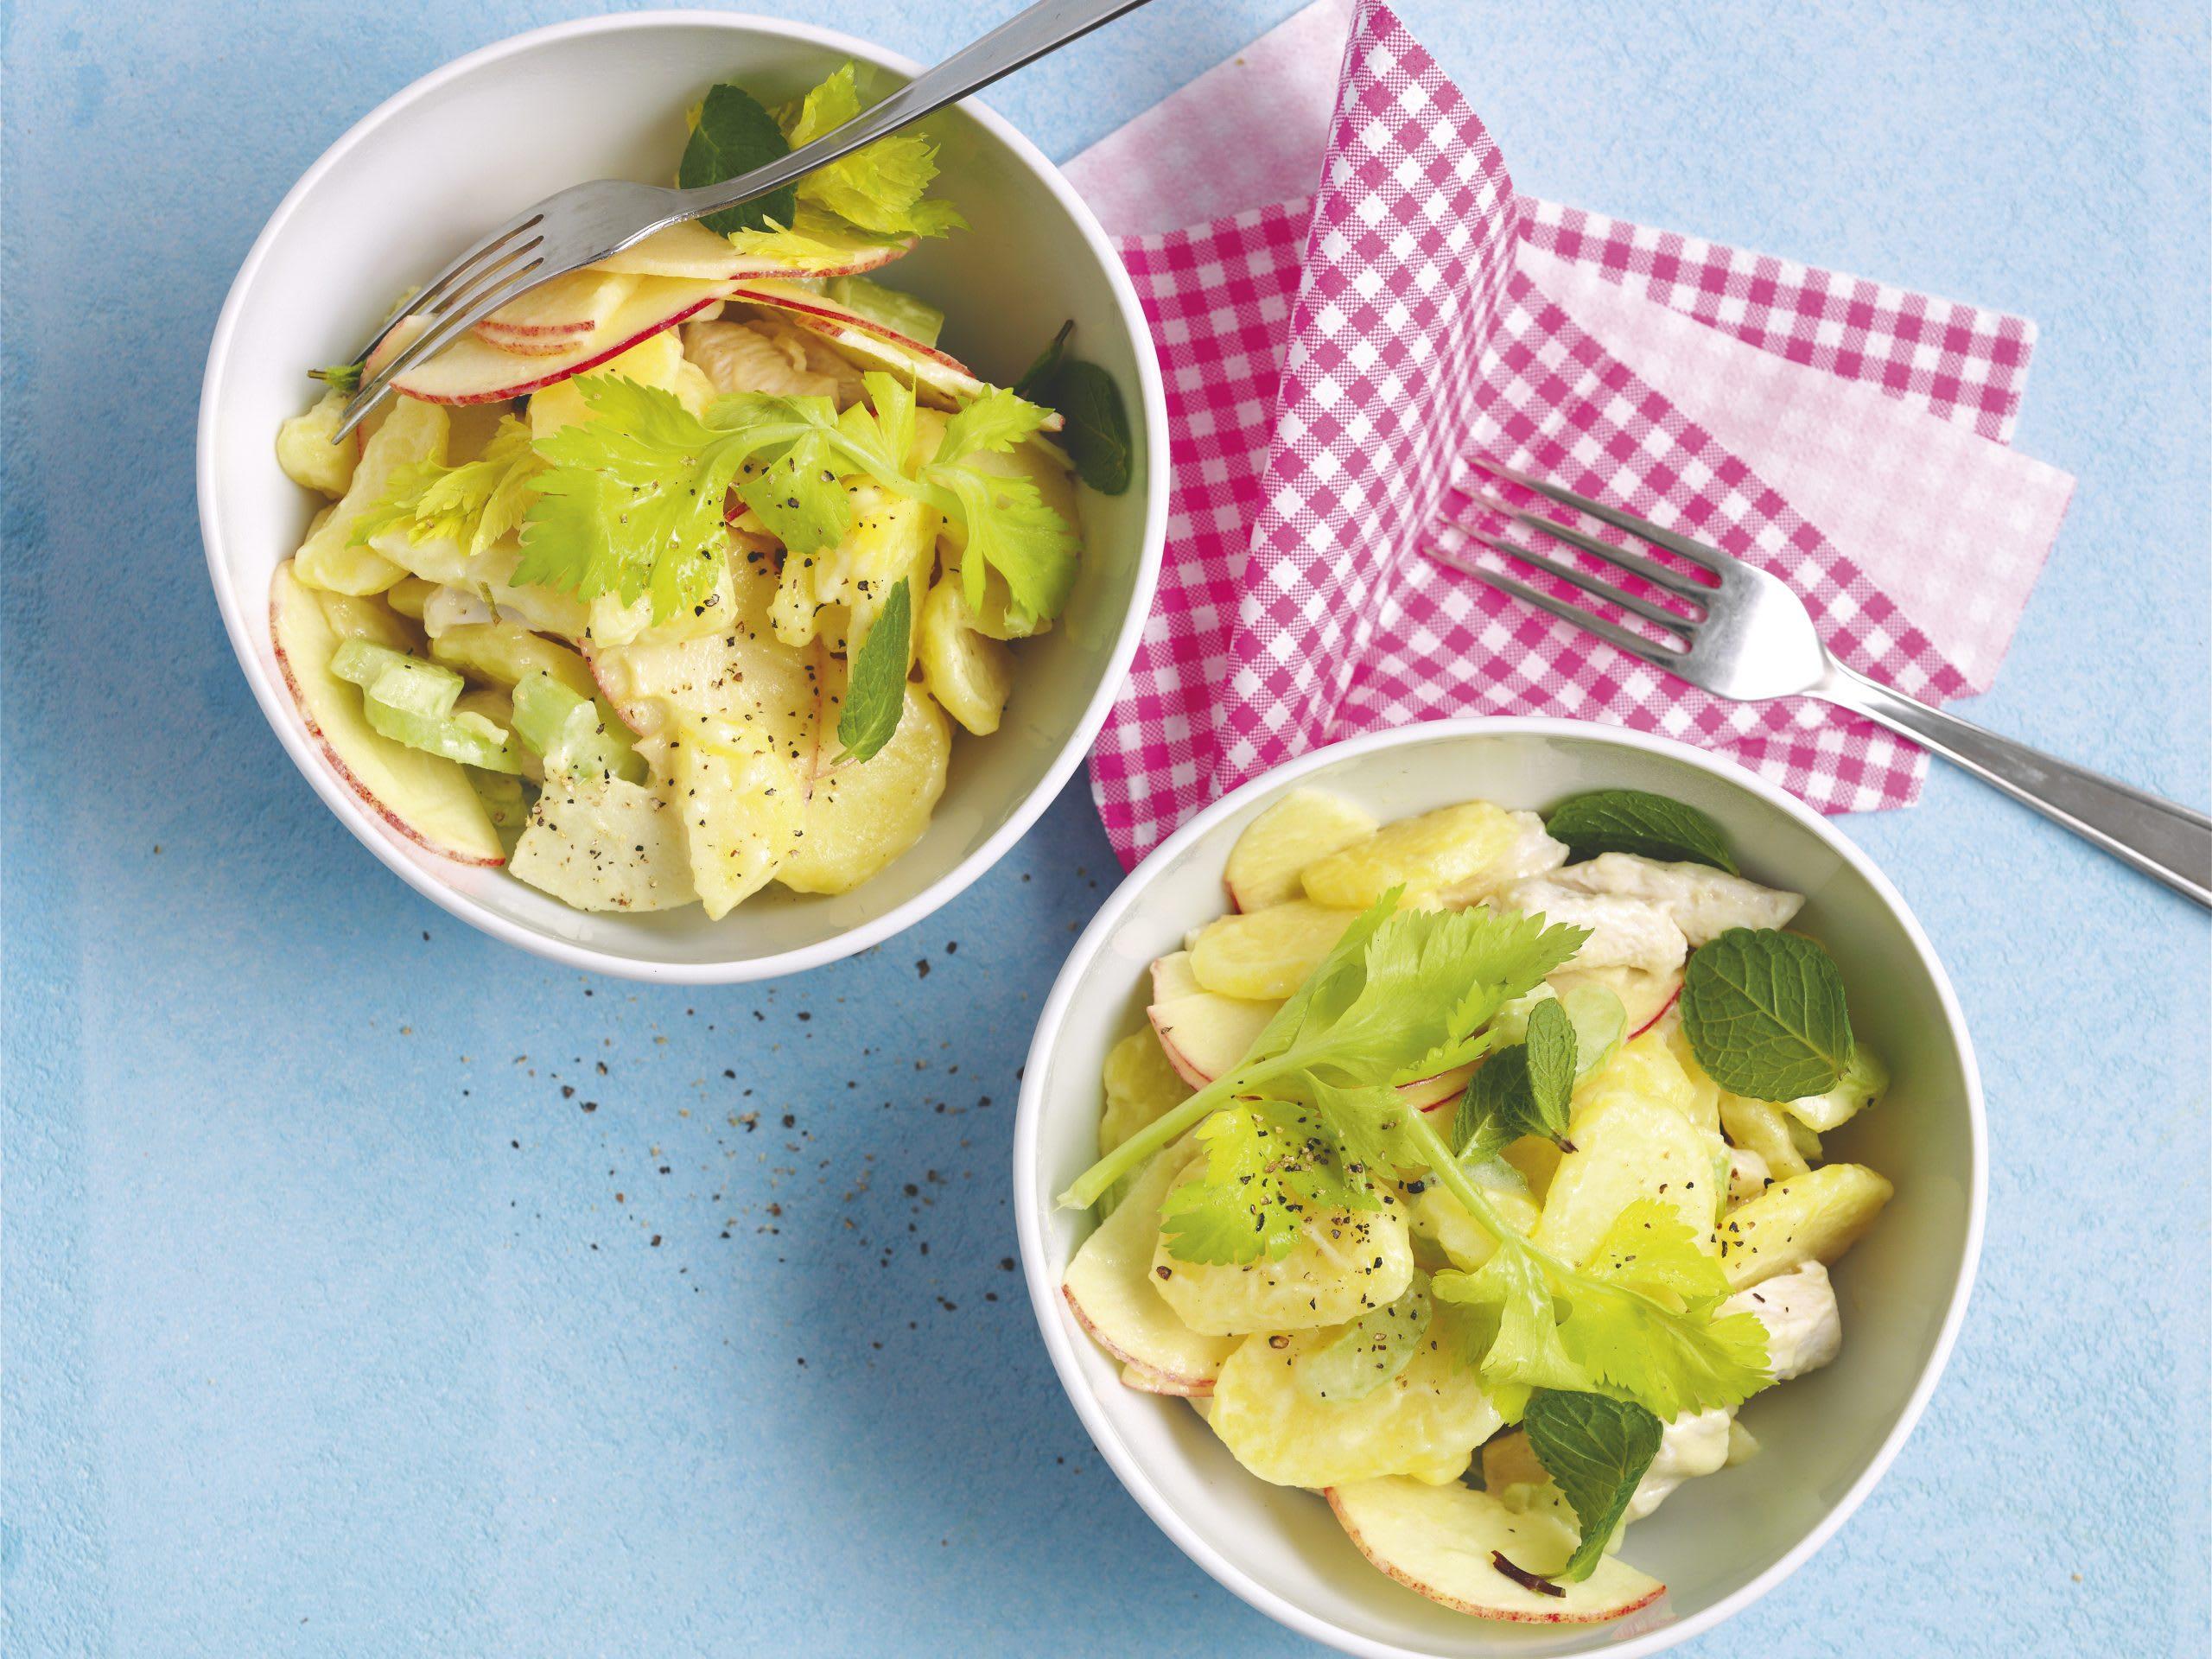 Poulet-Kartoffel-Salat mit Joghurtsauce